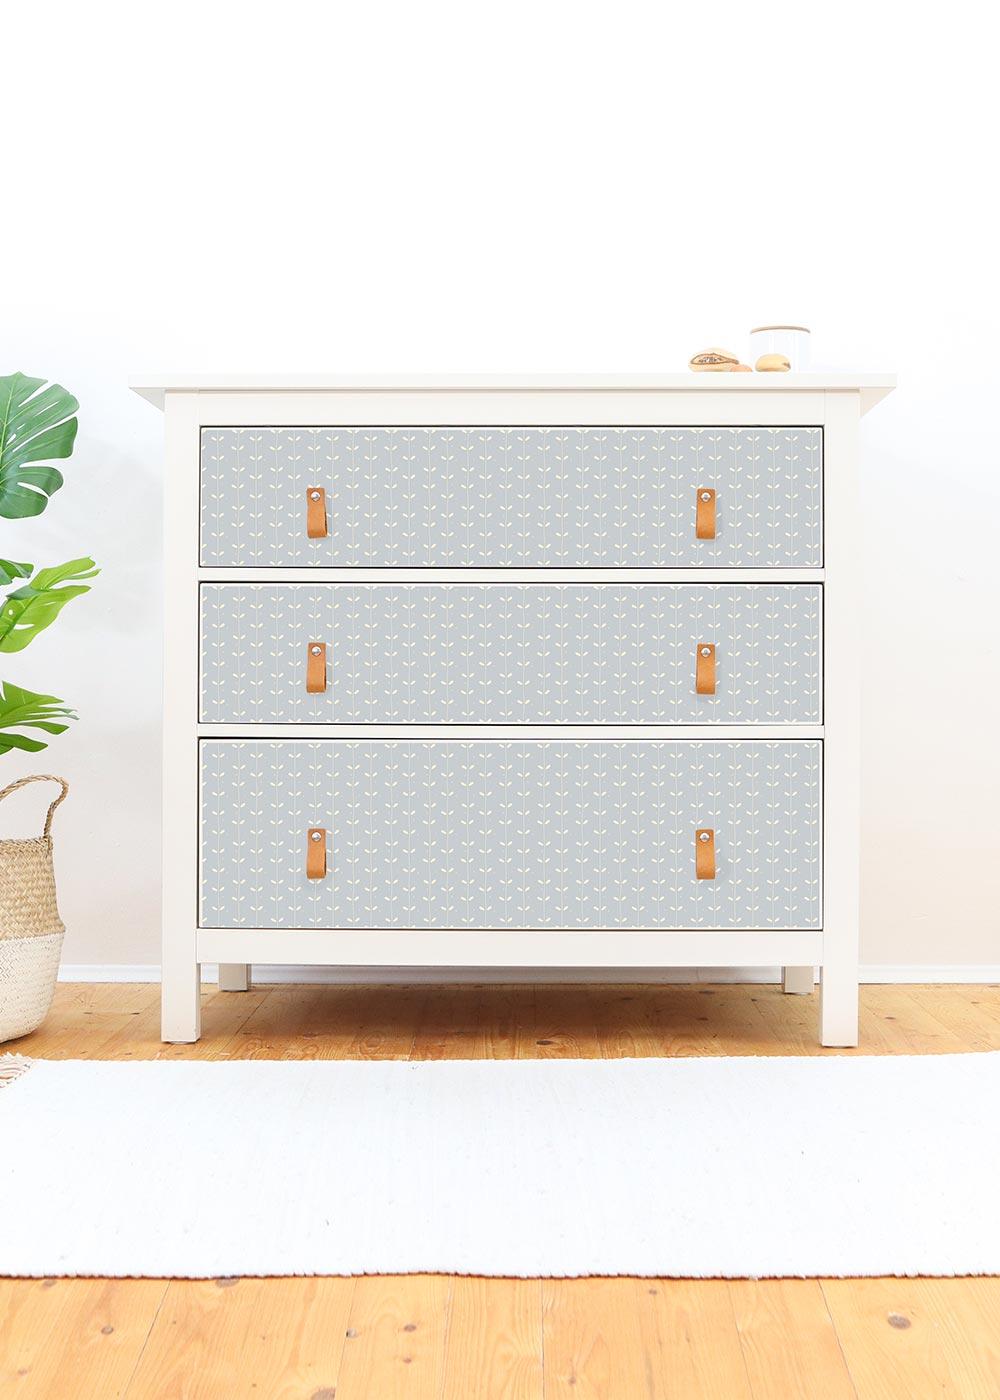 Ikea Hemnes Kommode Ährig eisblau Frontansicht